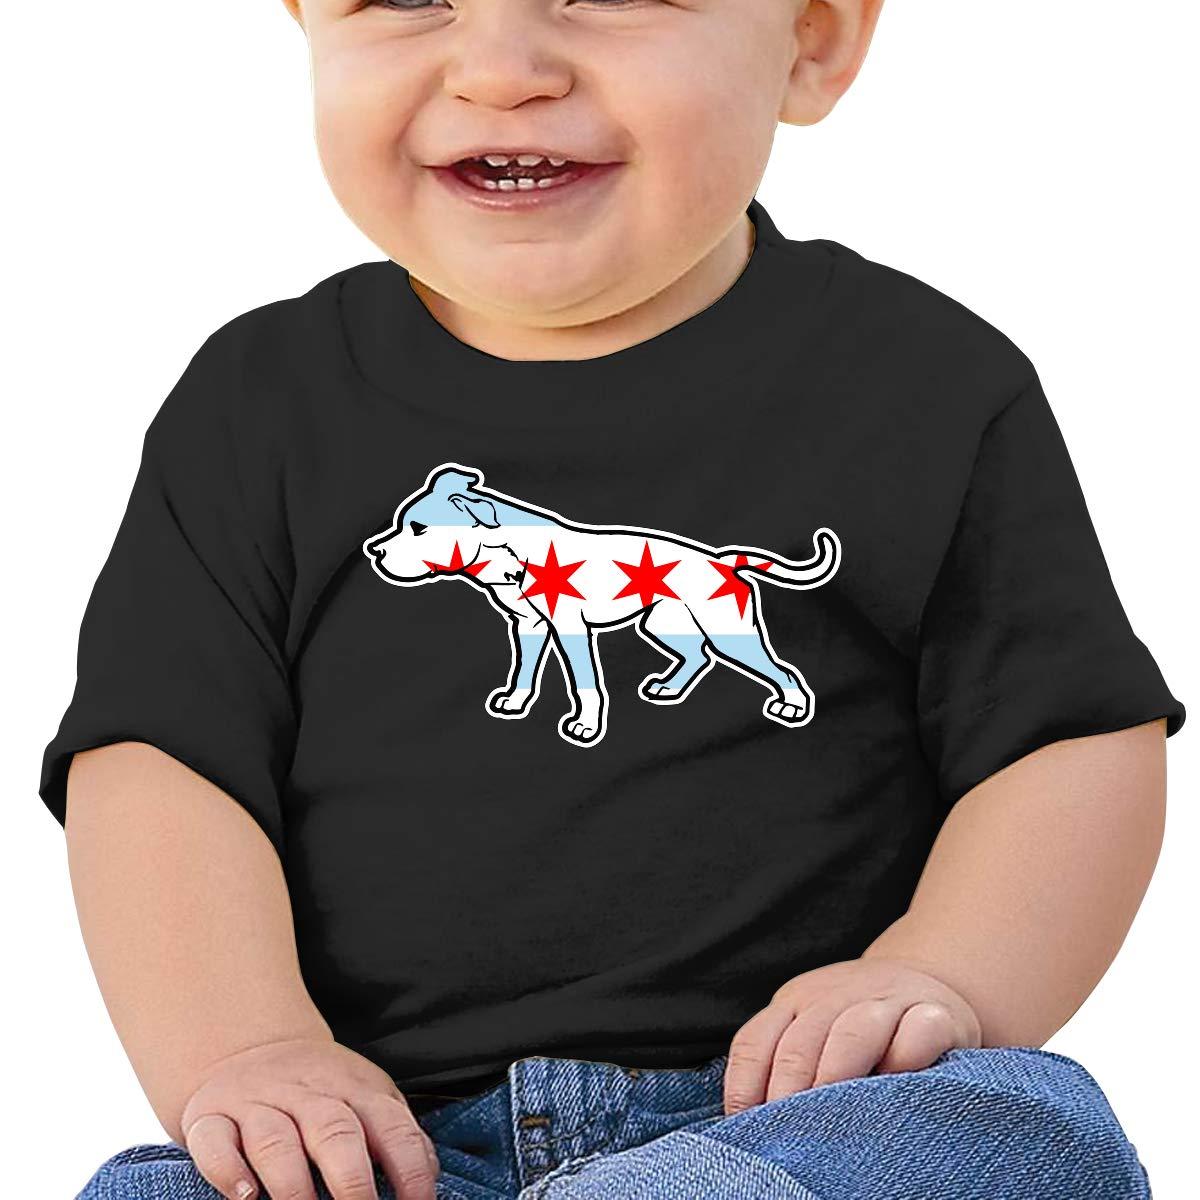 ZUGFGF-S3 Pit Bull Chicago Flag Baby Boy Girl Newborn Short Sleeve T Shirts 6-24 Month Cotton Tops